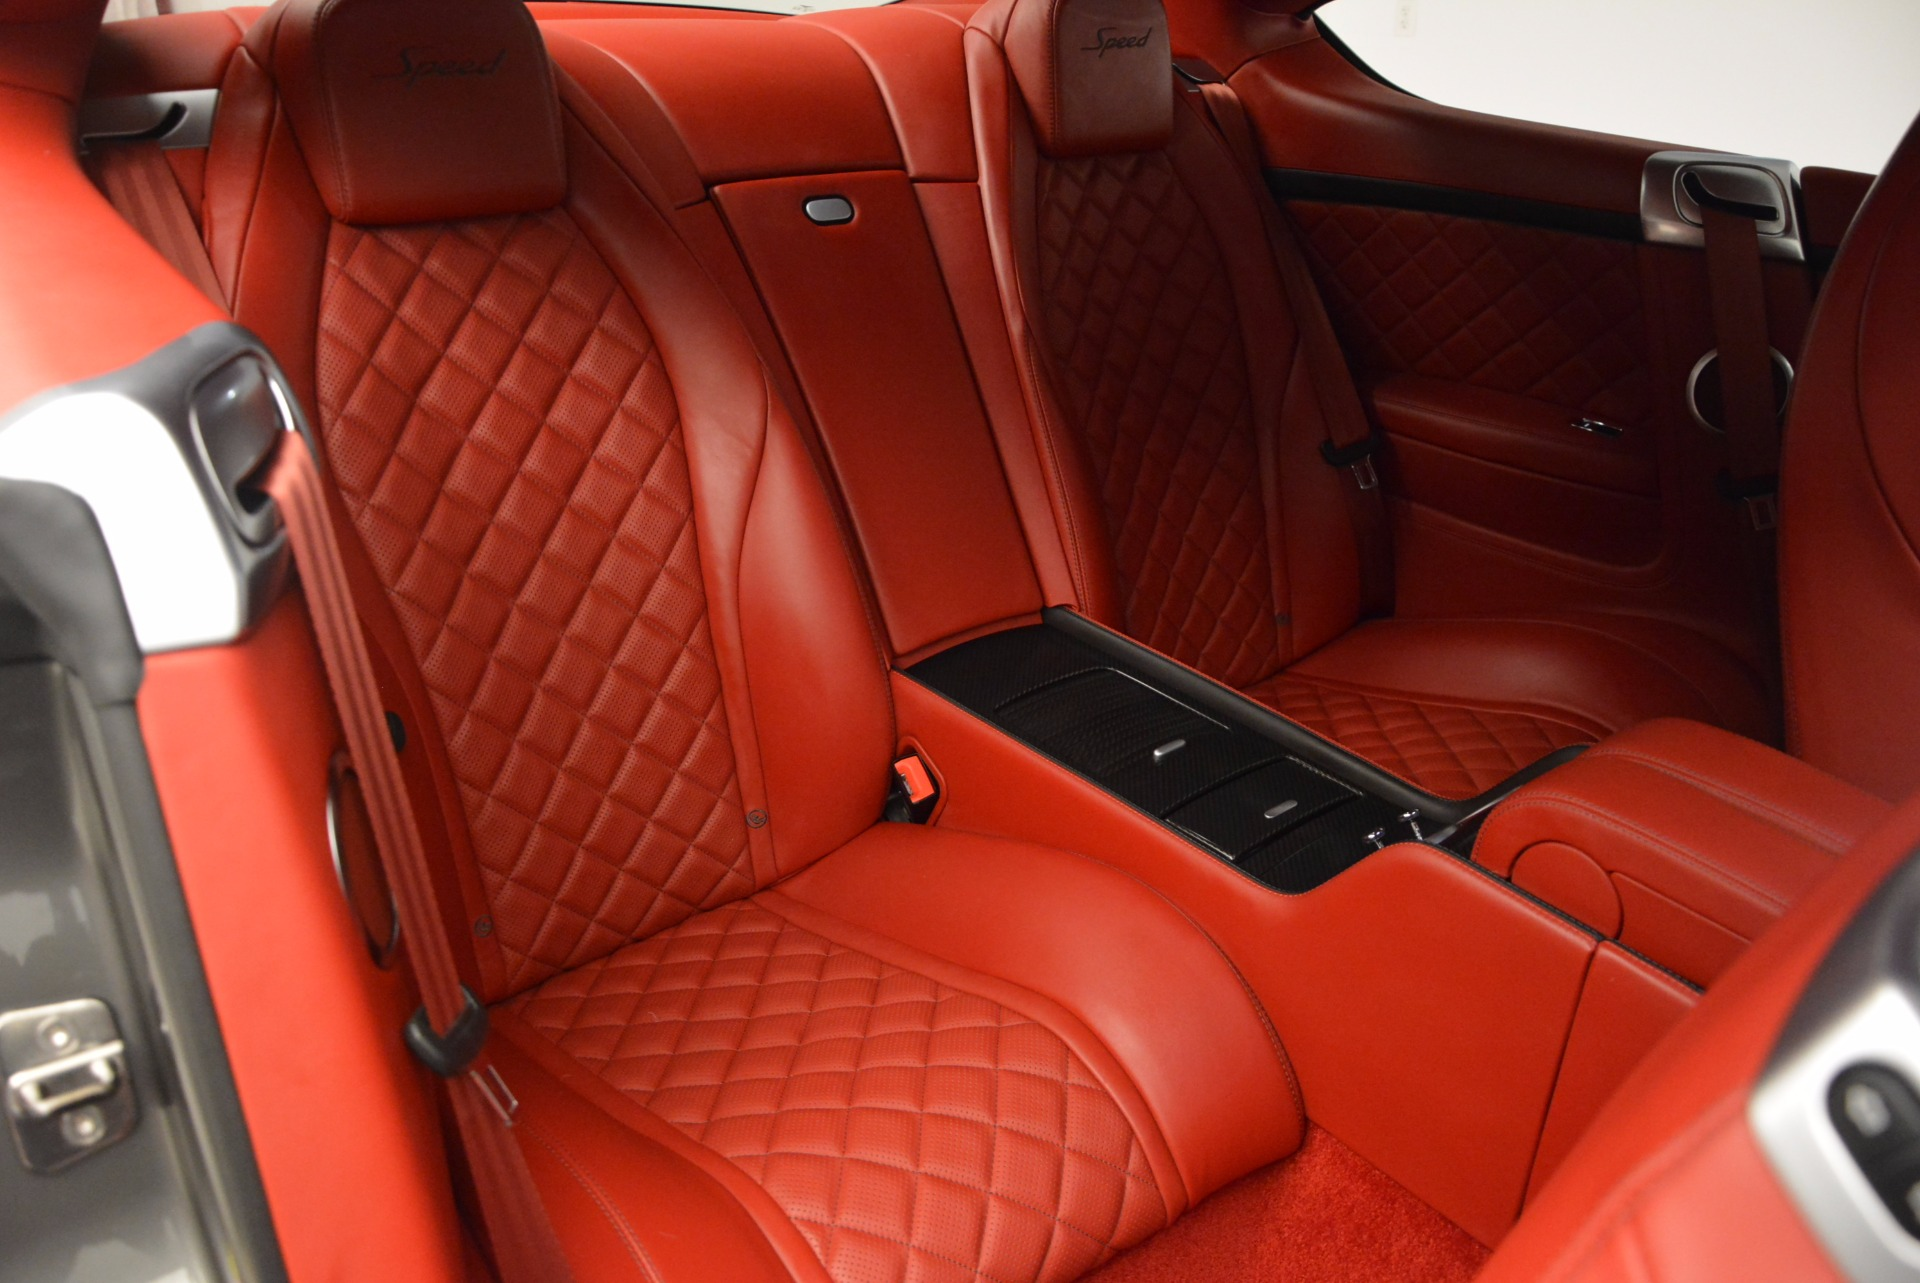 Used 2016 Bentley Continental GT Speed For Sale In Westport, CT 910_p41